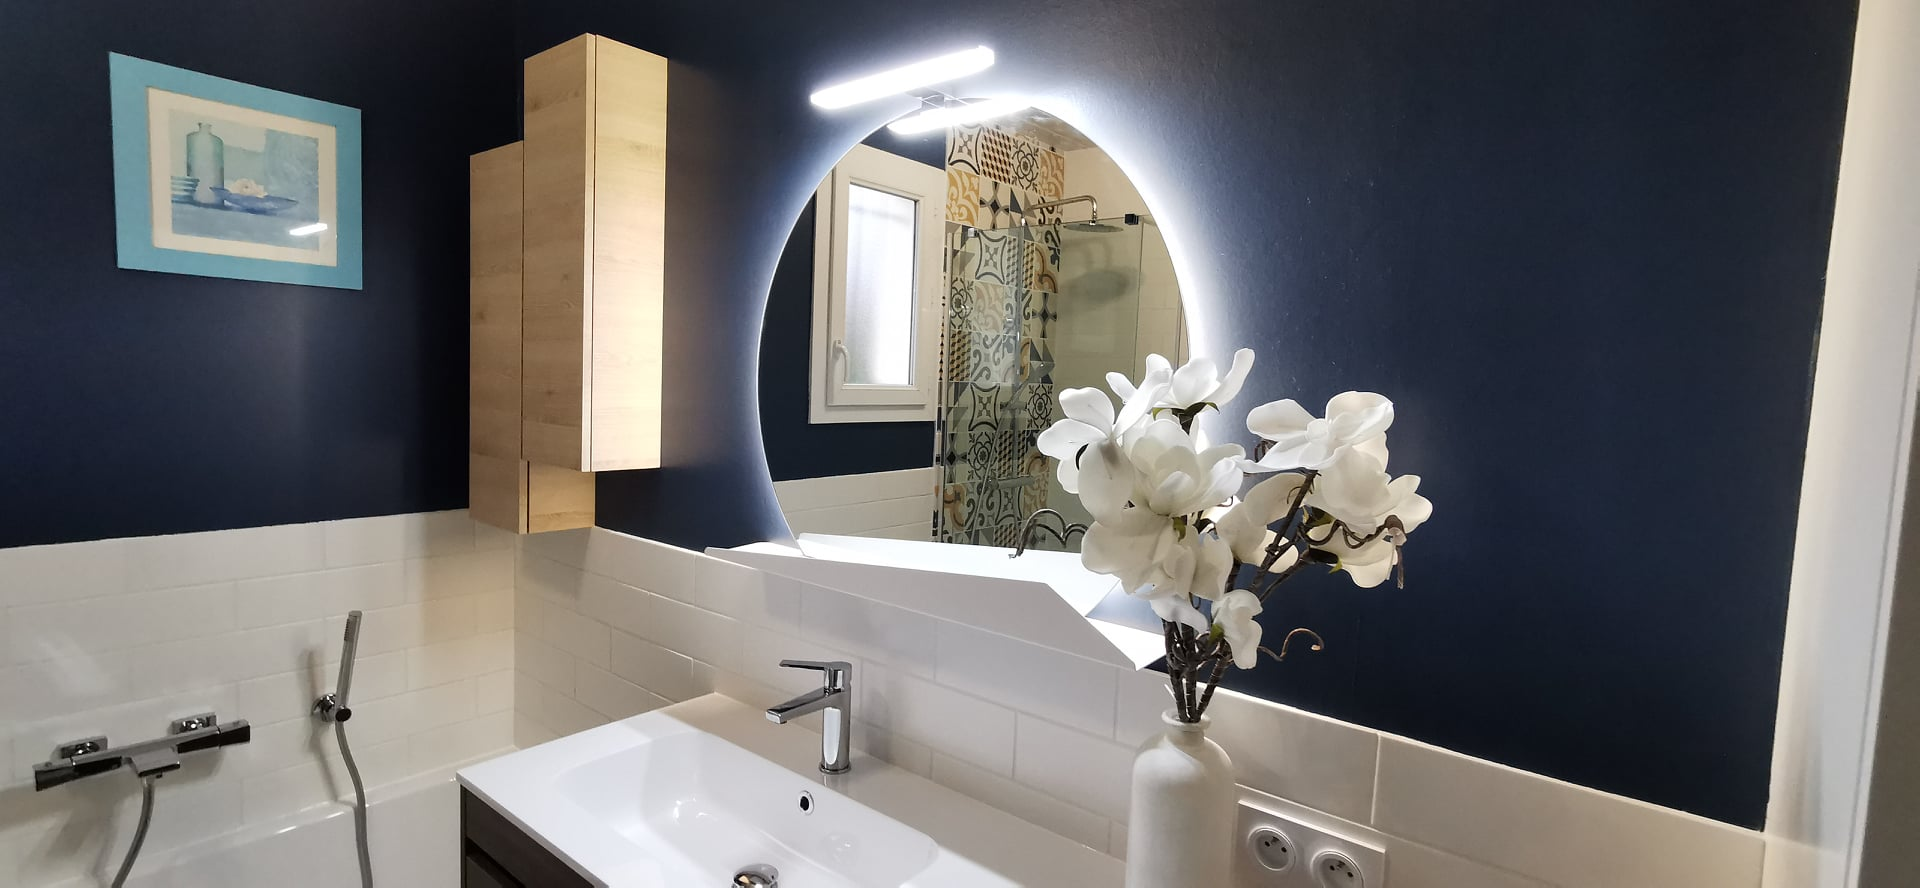 salle bain nature flashy vitaminée mobilier bleu